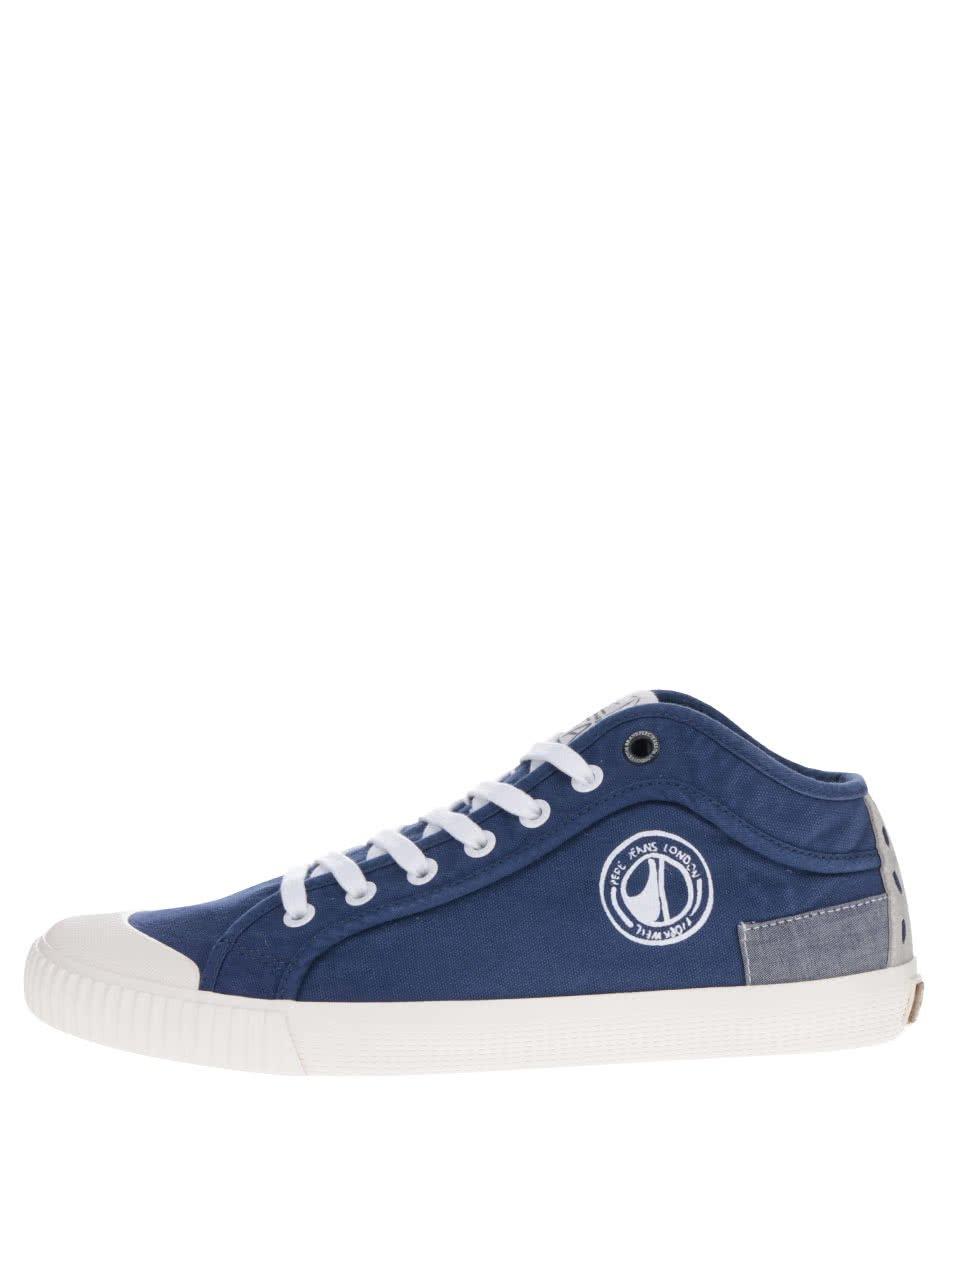 Modré pánské tenisky s logem Pepe Jeans Industry Tenugui